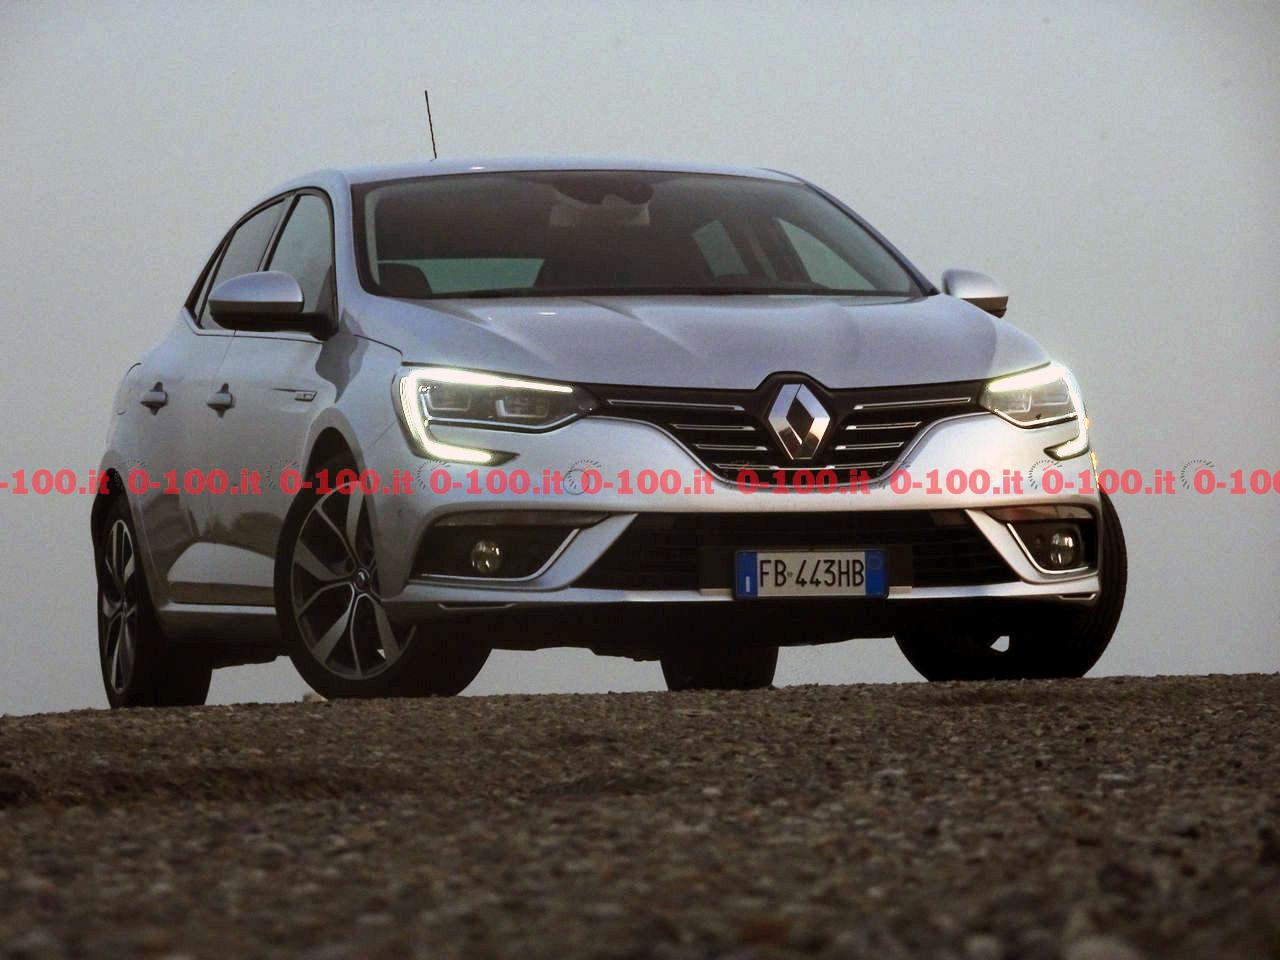 Renault-Megane-GT-Bose-dCi-130-test-prova-opinioni_0-100_3